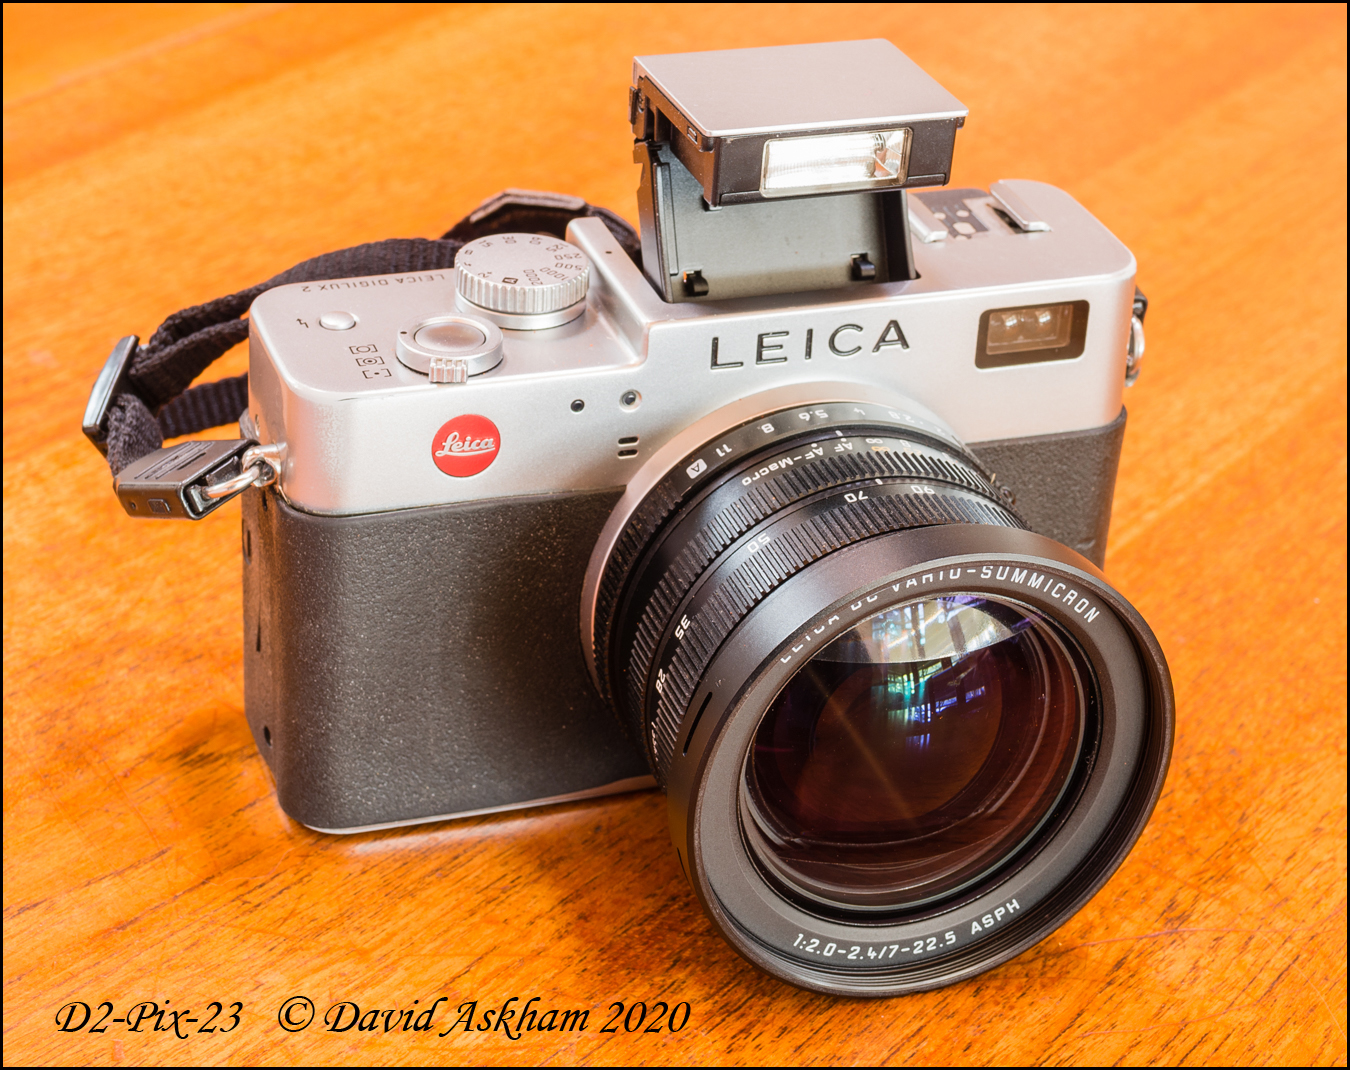 Digilux 2 with flash set to 90° (Taken with Leica X-Vario)